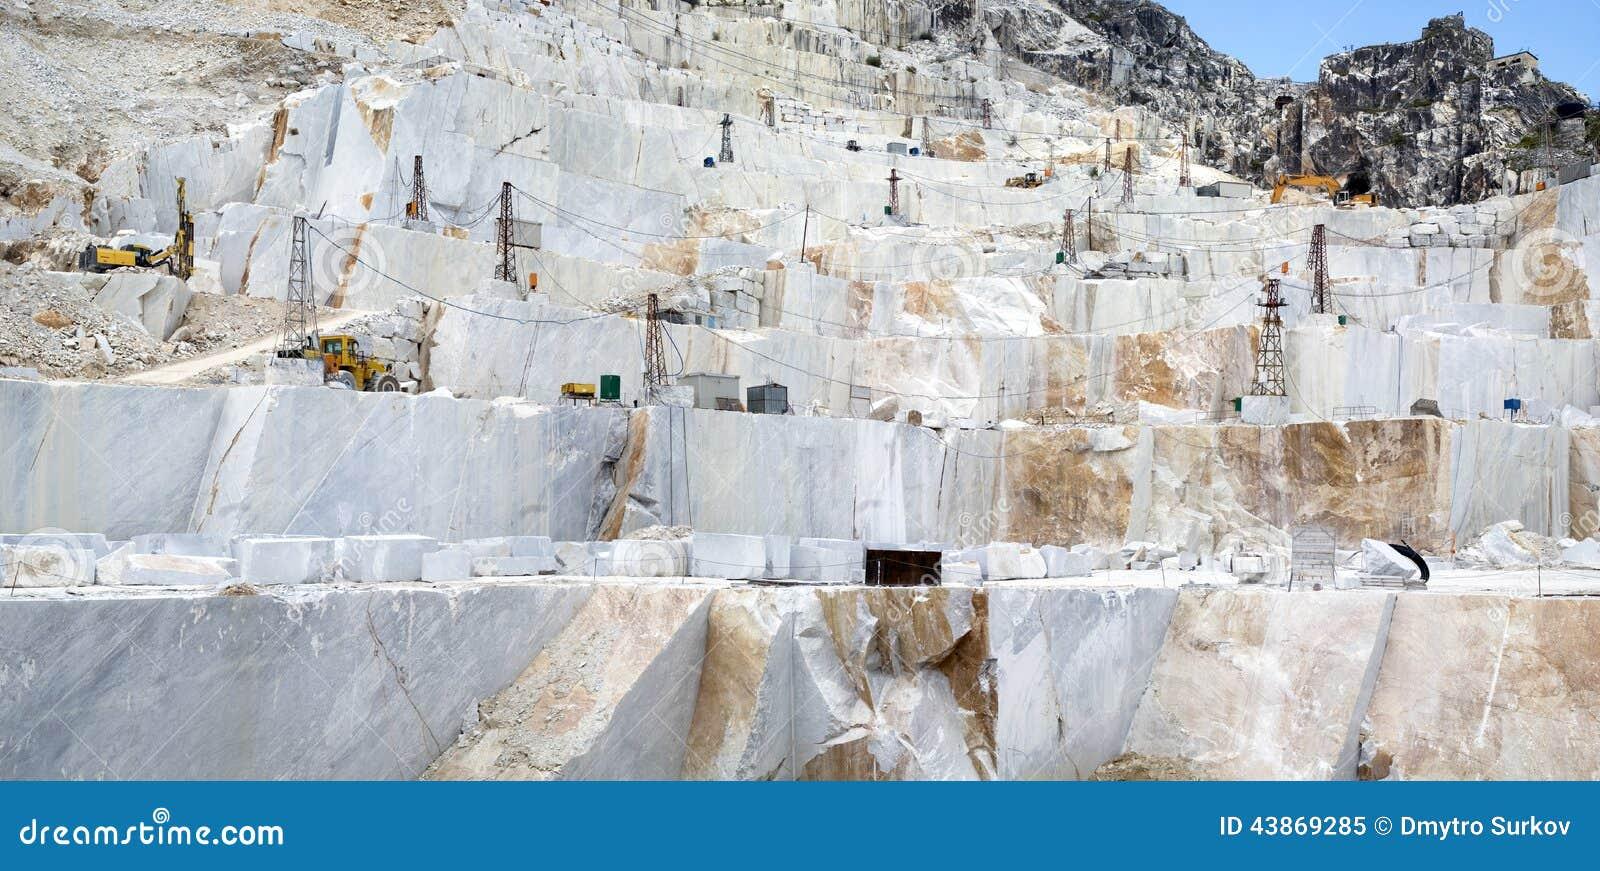 A Carrara marble quarry stock image  Image of digging - 43869285